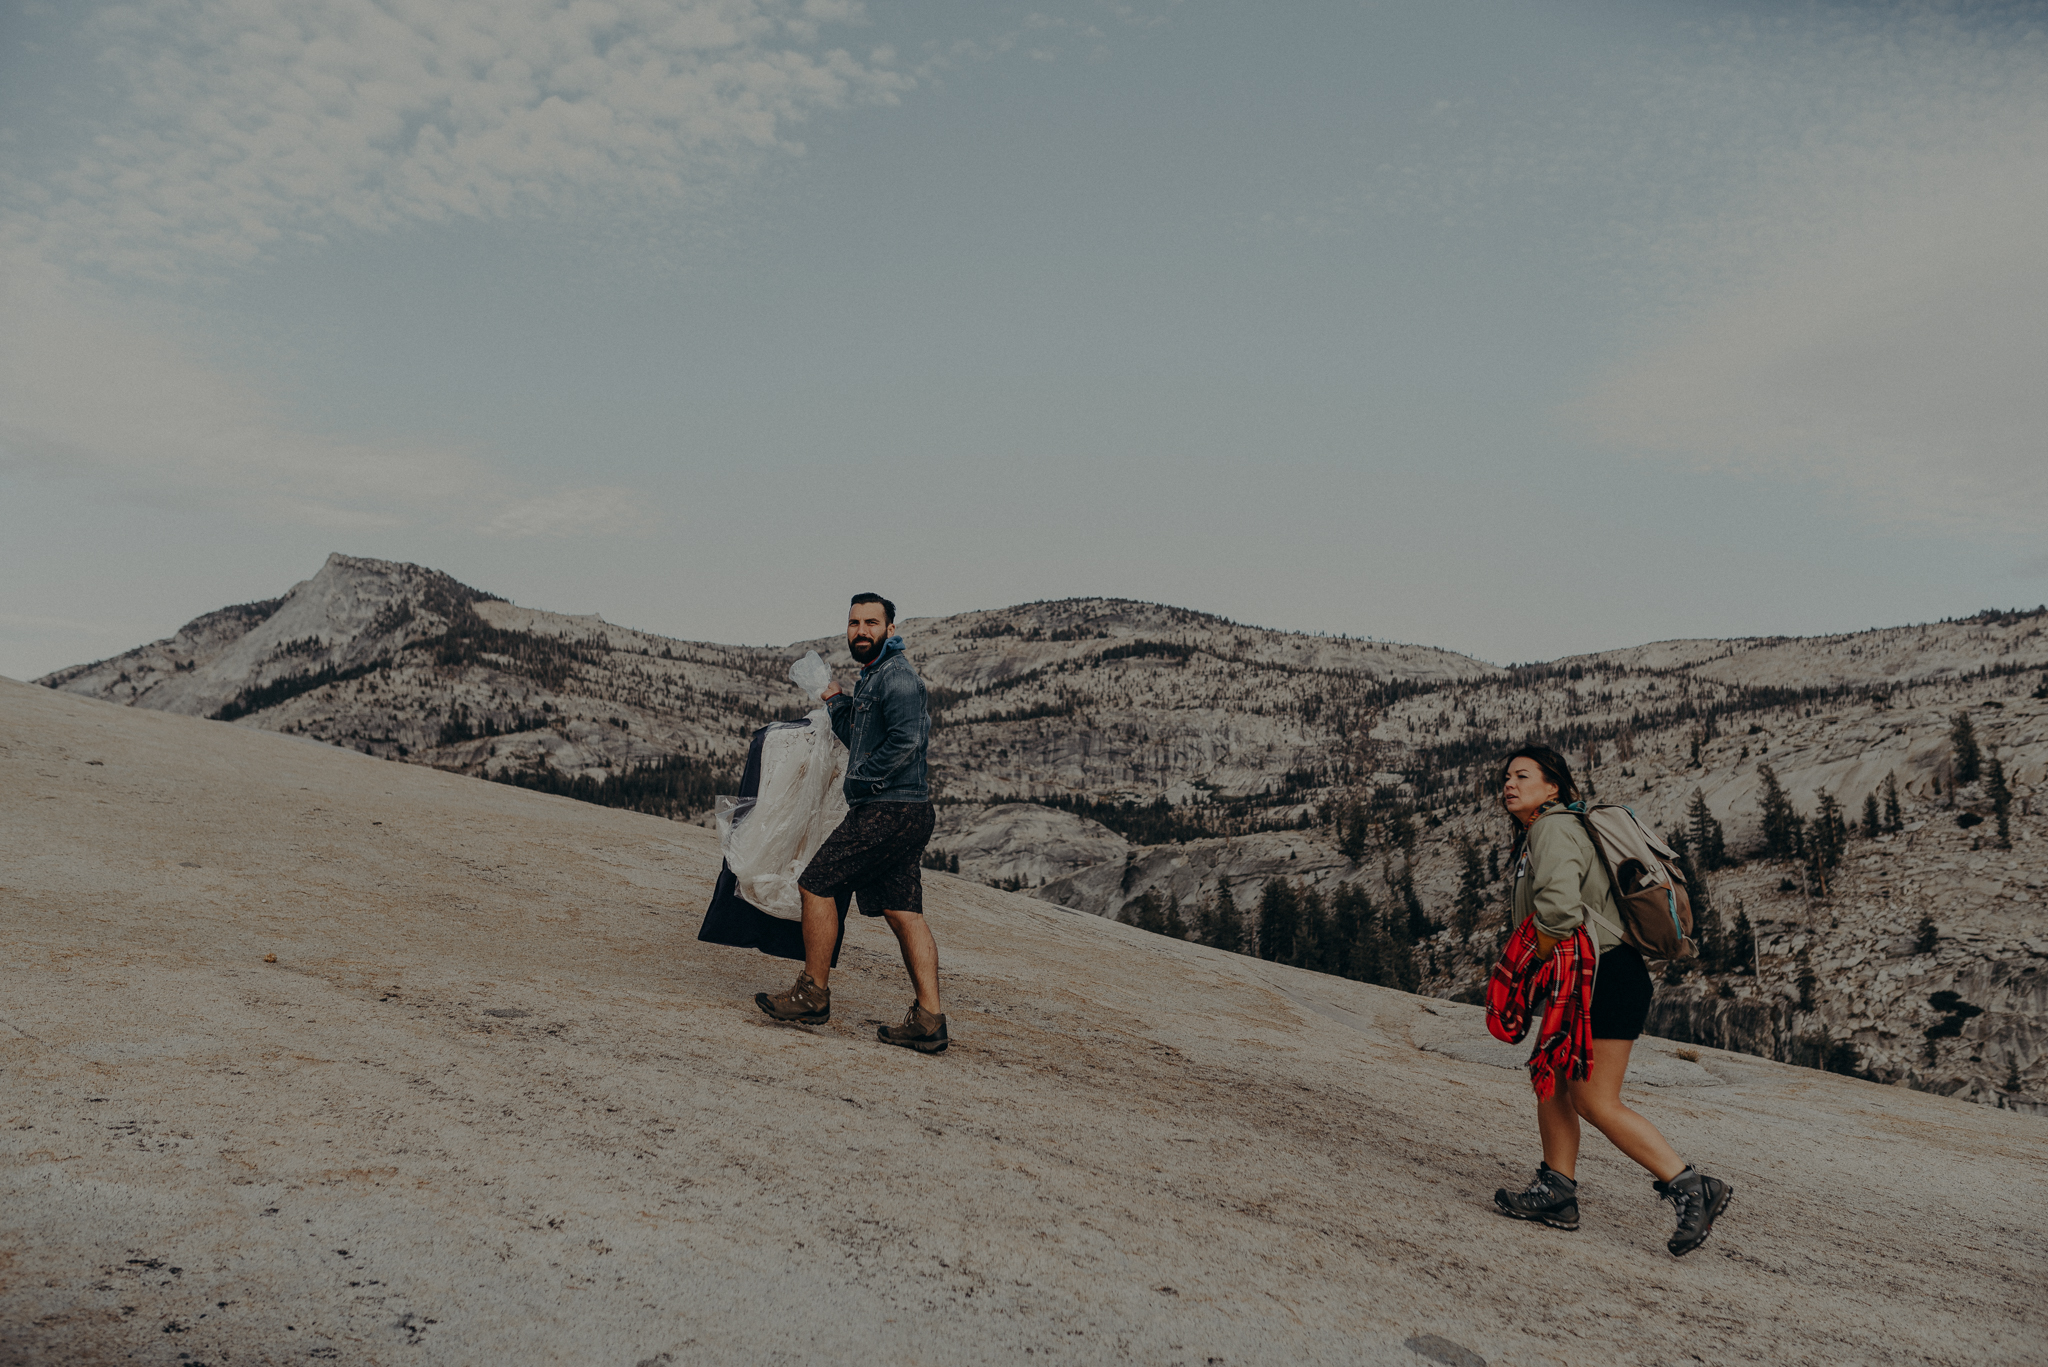 Yosemite Elopement Photographer - Evergreen Lodge Wedding Photographer - IsaiahAndTaylor.com-007.jpg